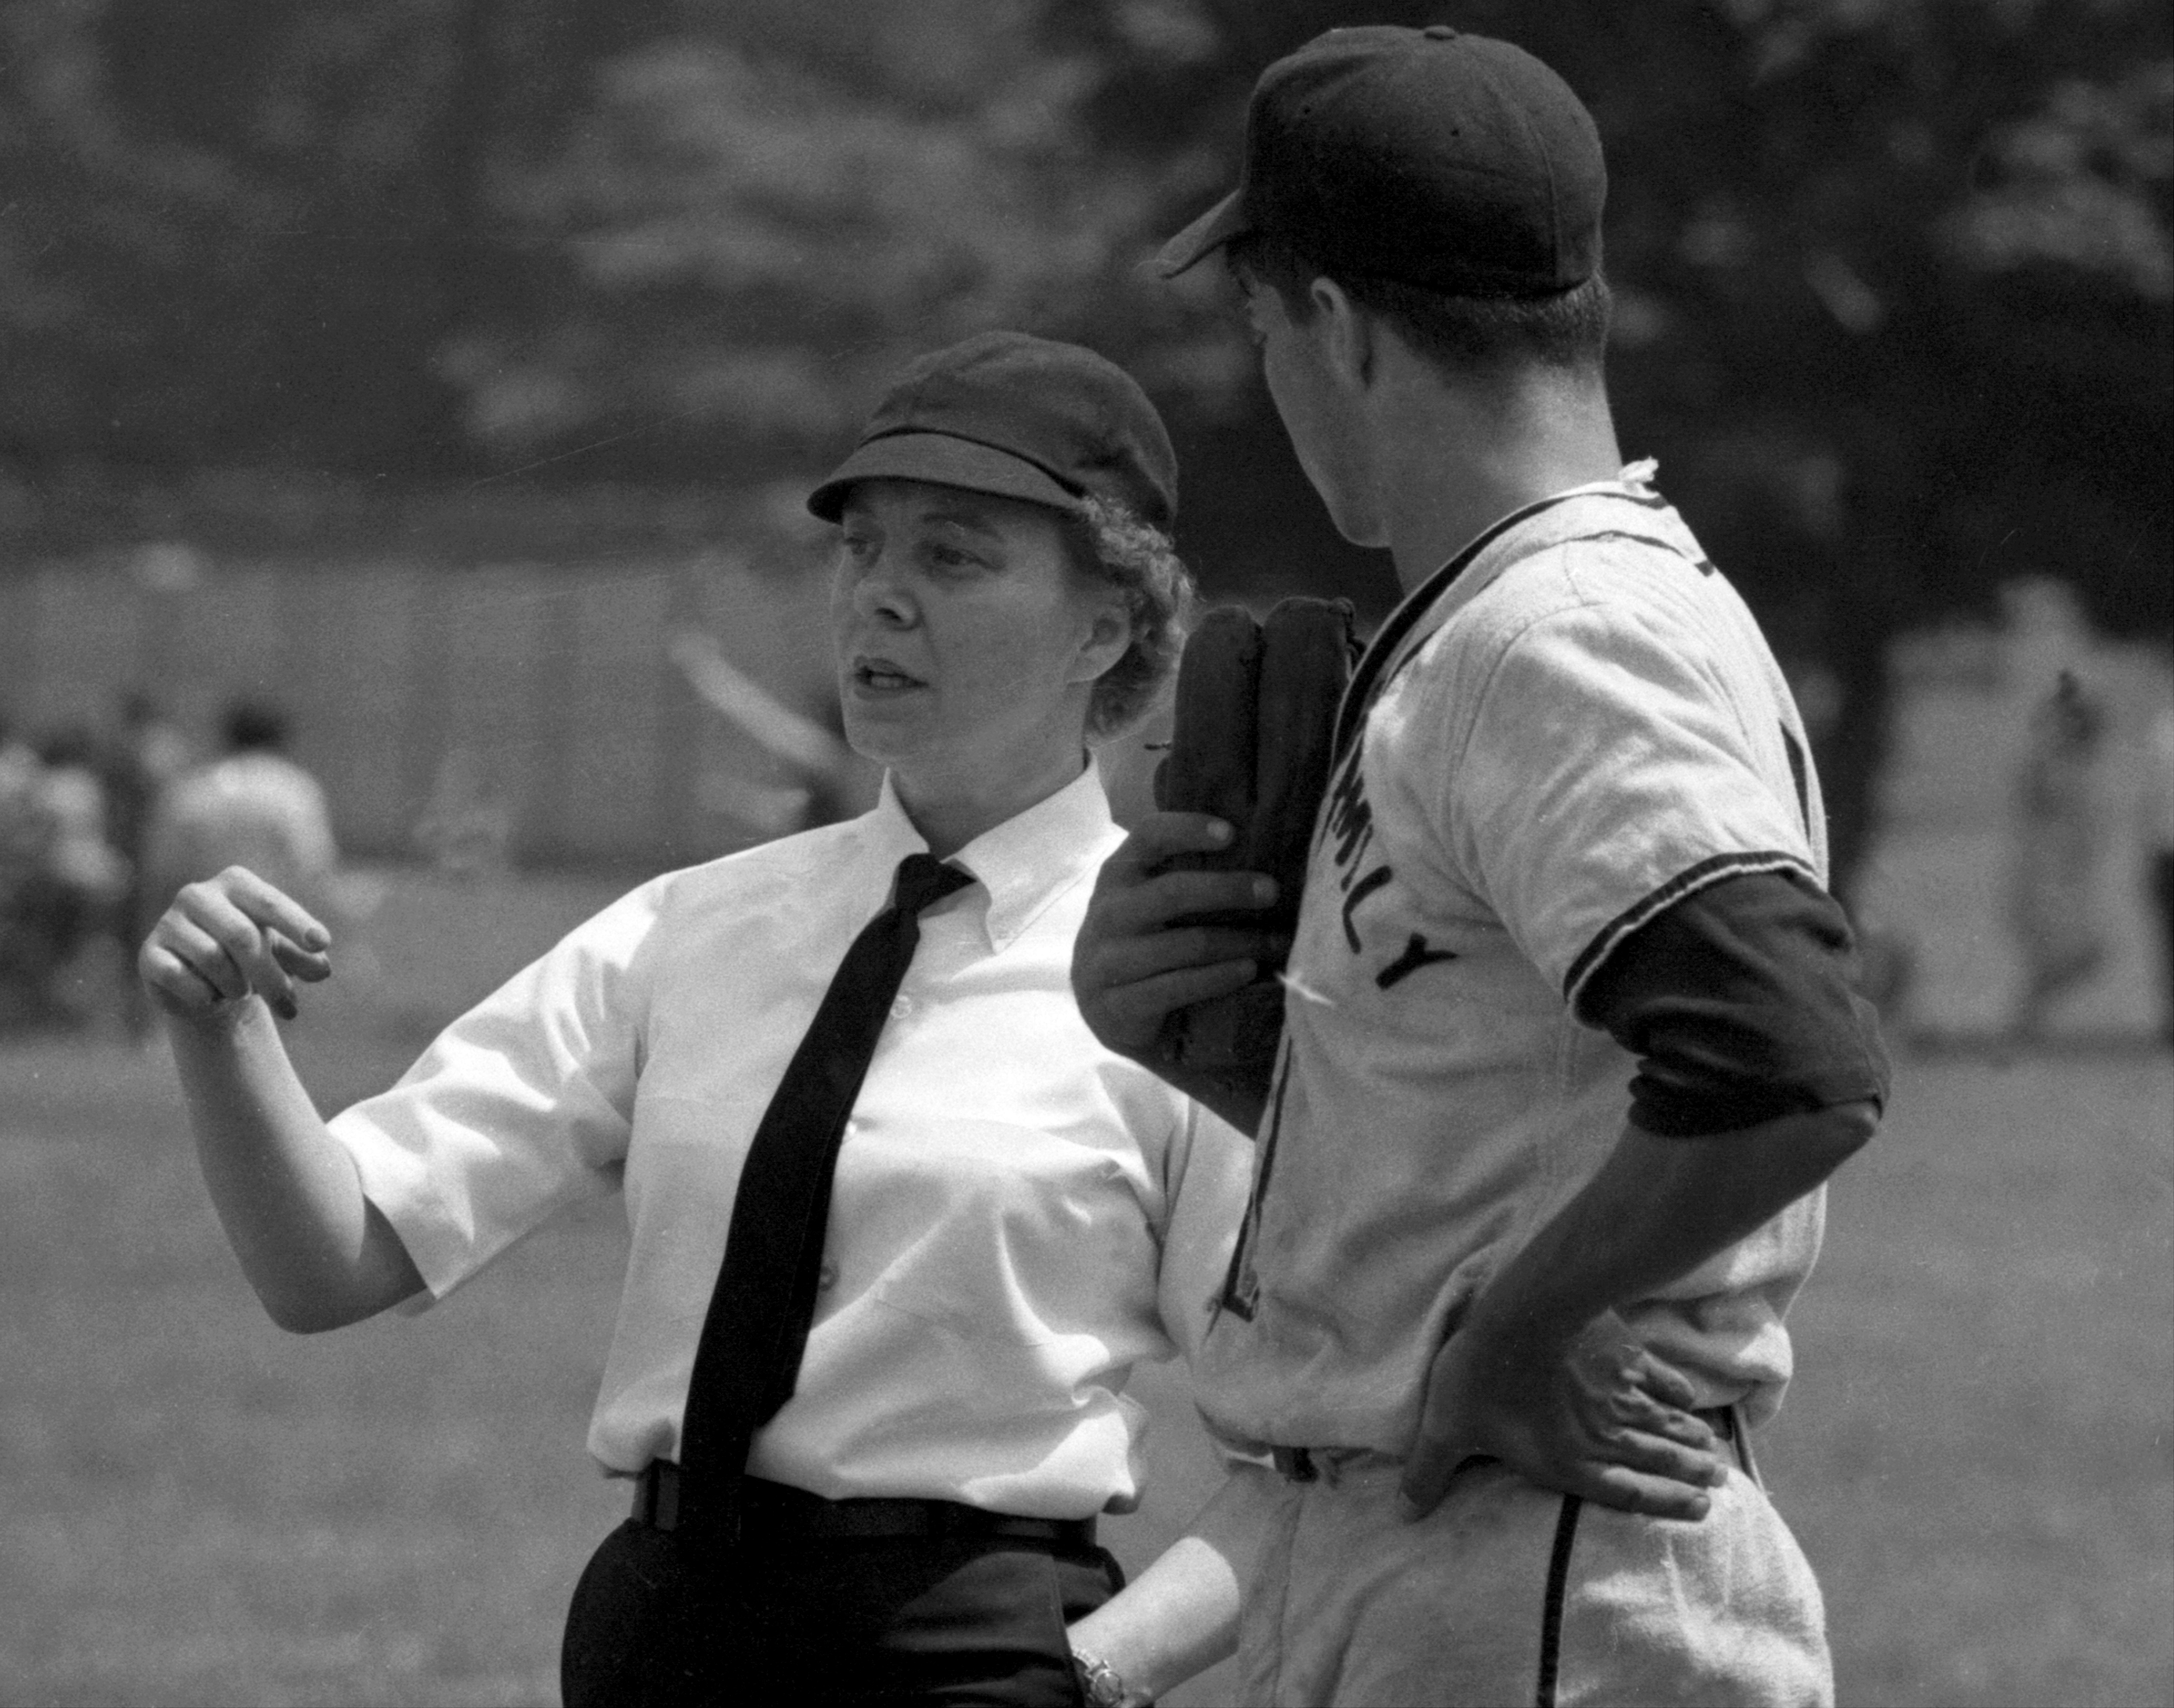 Woman umpire Bernice Gera at Holy Family baseball game at Cu